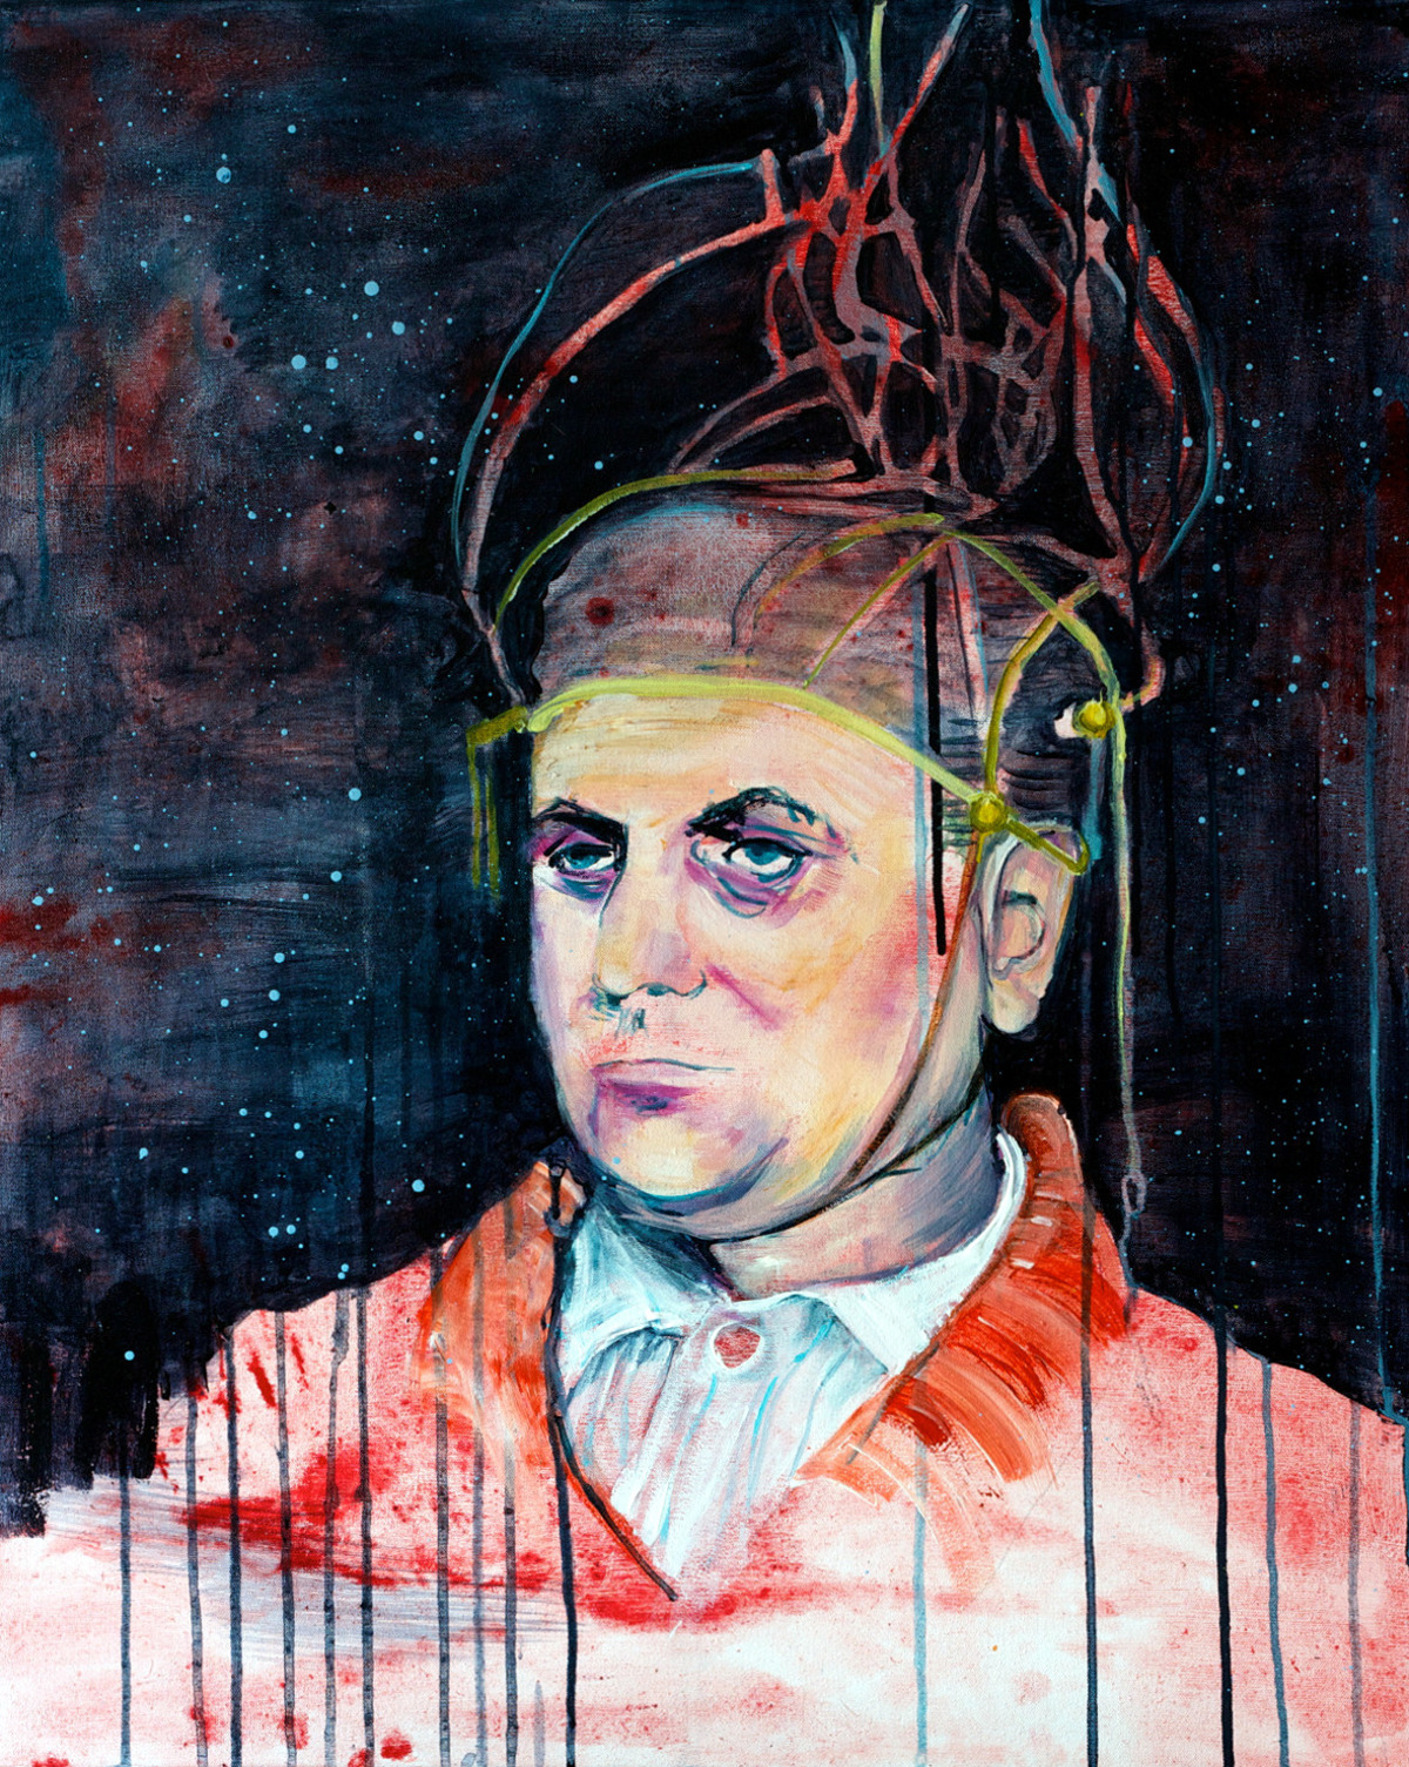 "Kathryn Cowen, 'Mr Nanoo"", 2013, acrylic and ink on canvas, 76.5 x 61cm"